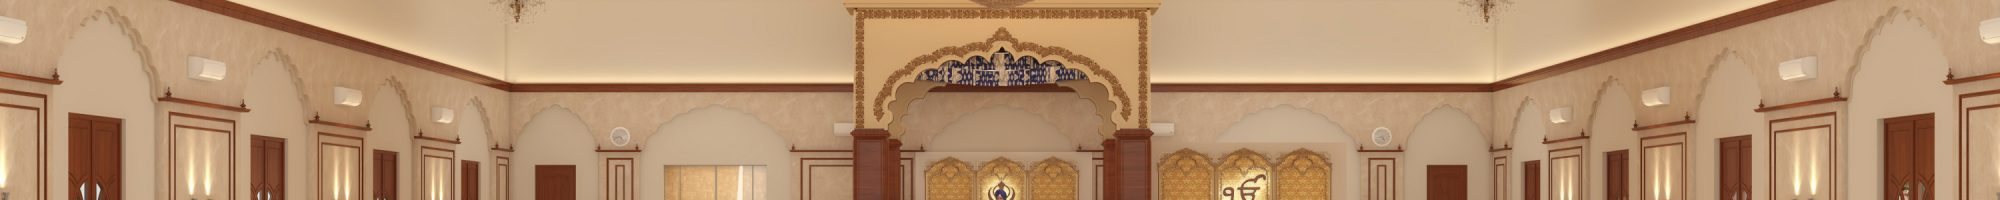 Main temple 1